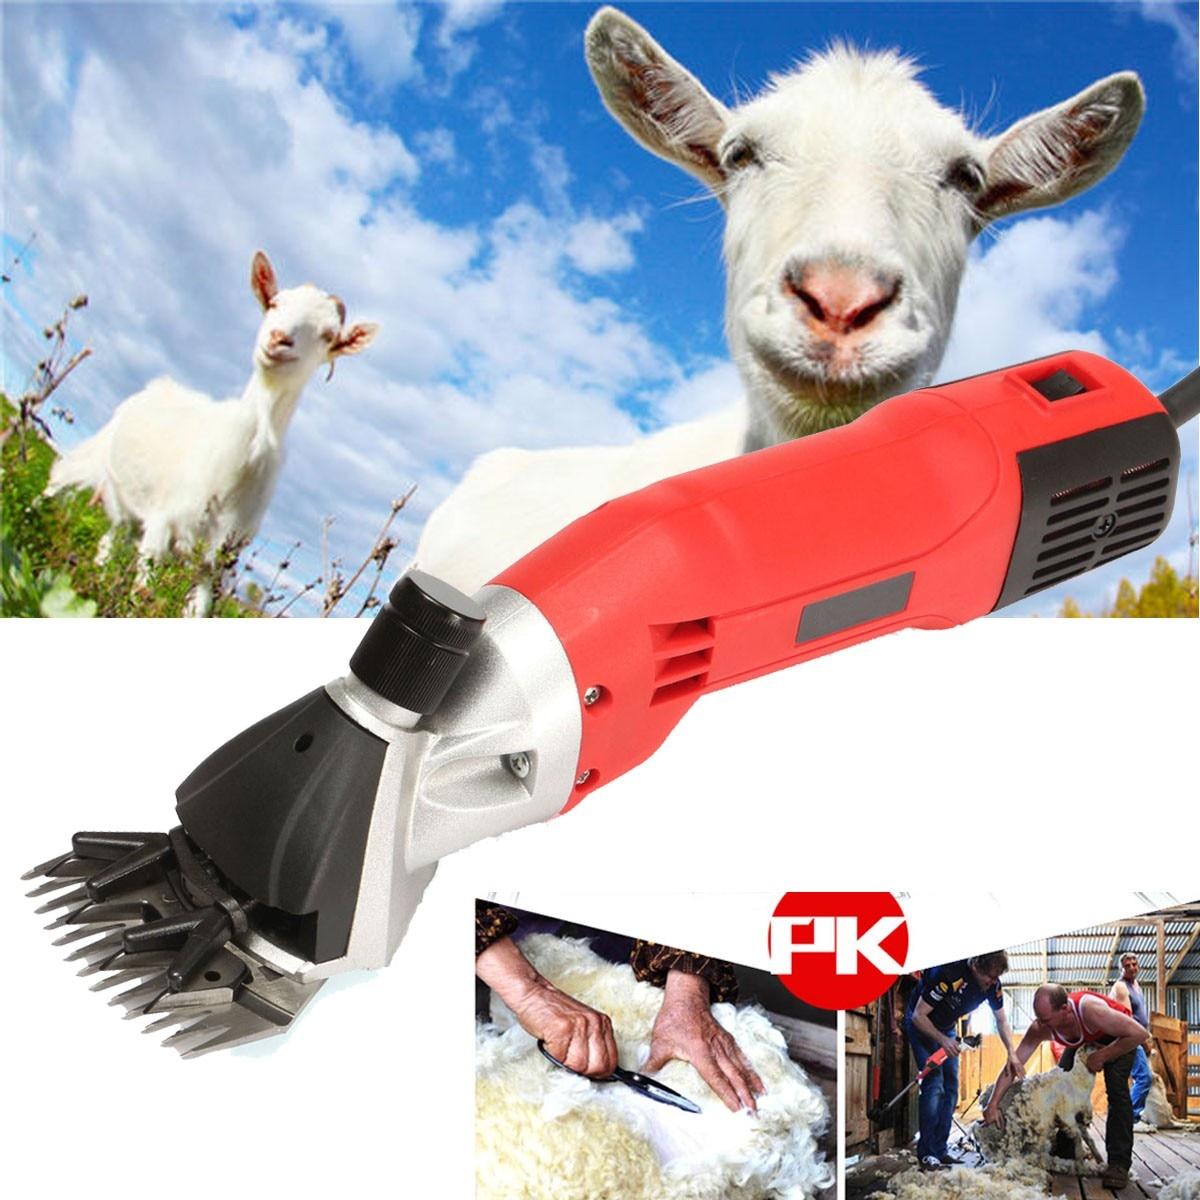 500W 220V AC Electric Sheep Goats Shearing Clipper Shear Alpaca Farm Shears Tool Aluminum Power Scissors hot selling 1pcs lot new 350w electric sheep goats shearing clipper shears electric wool shear